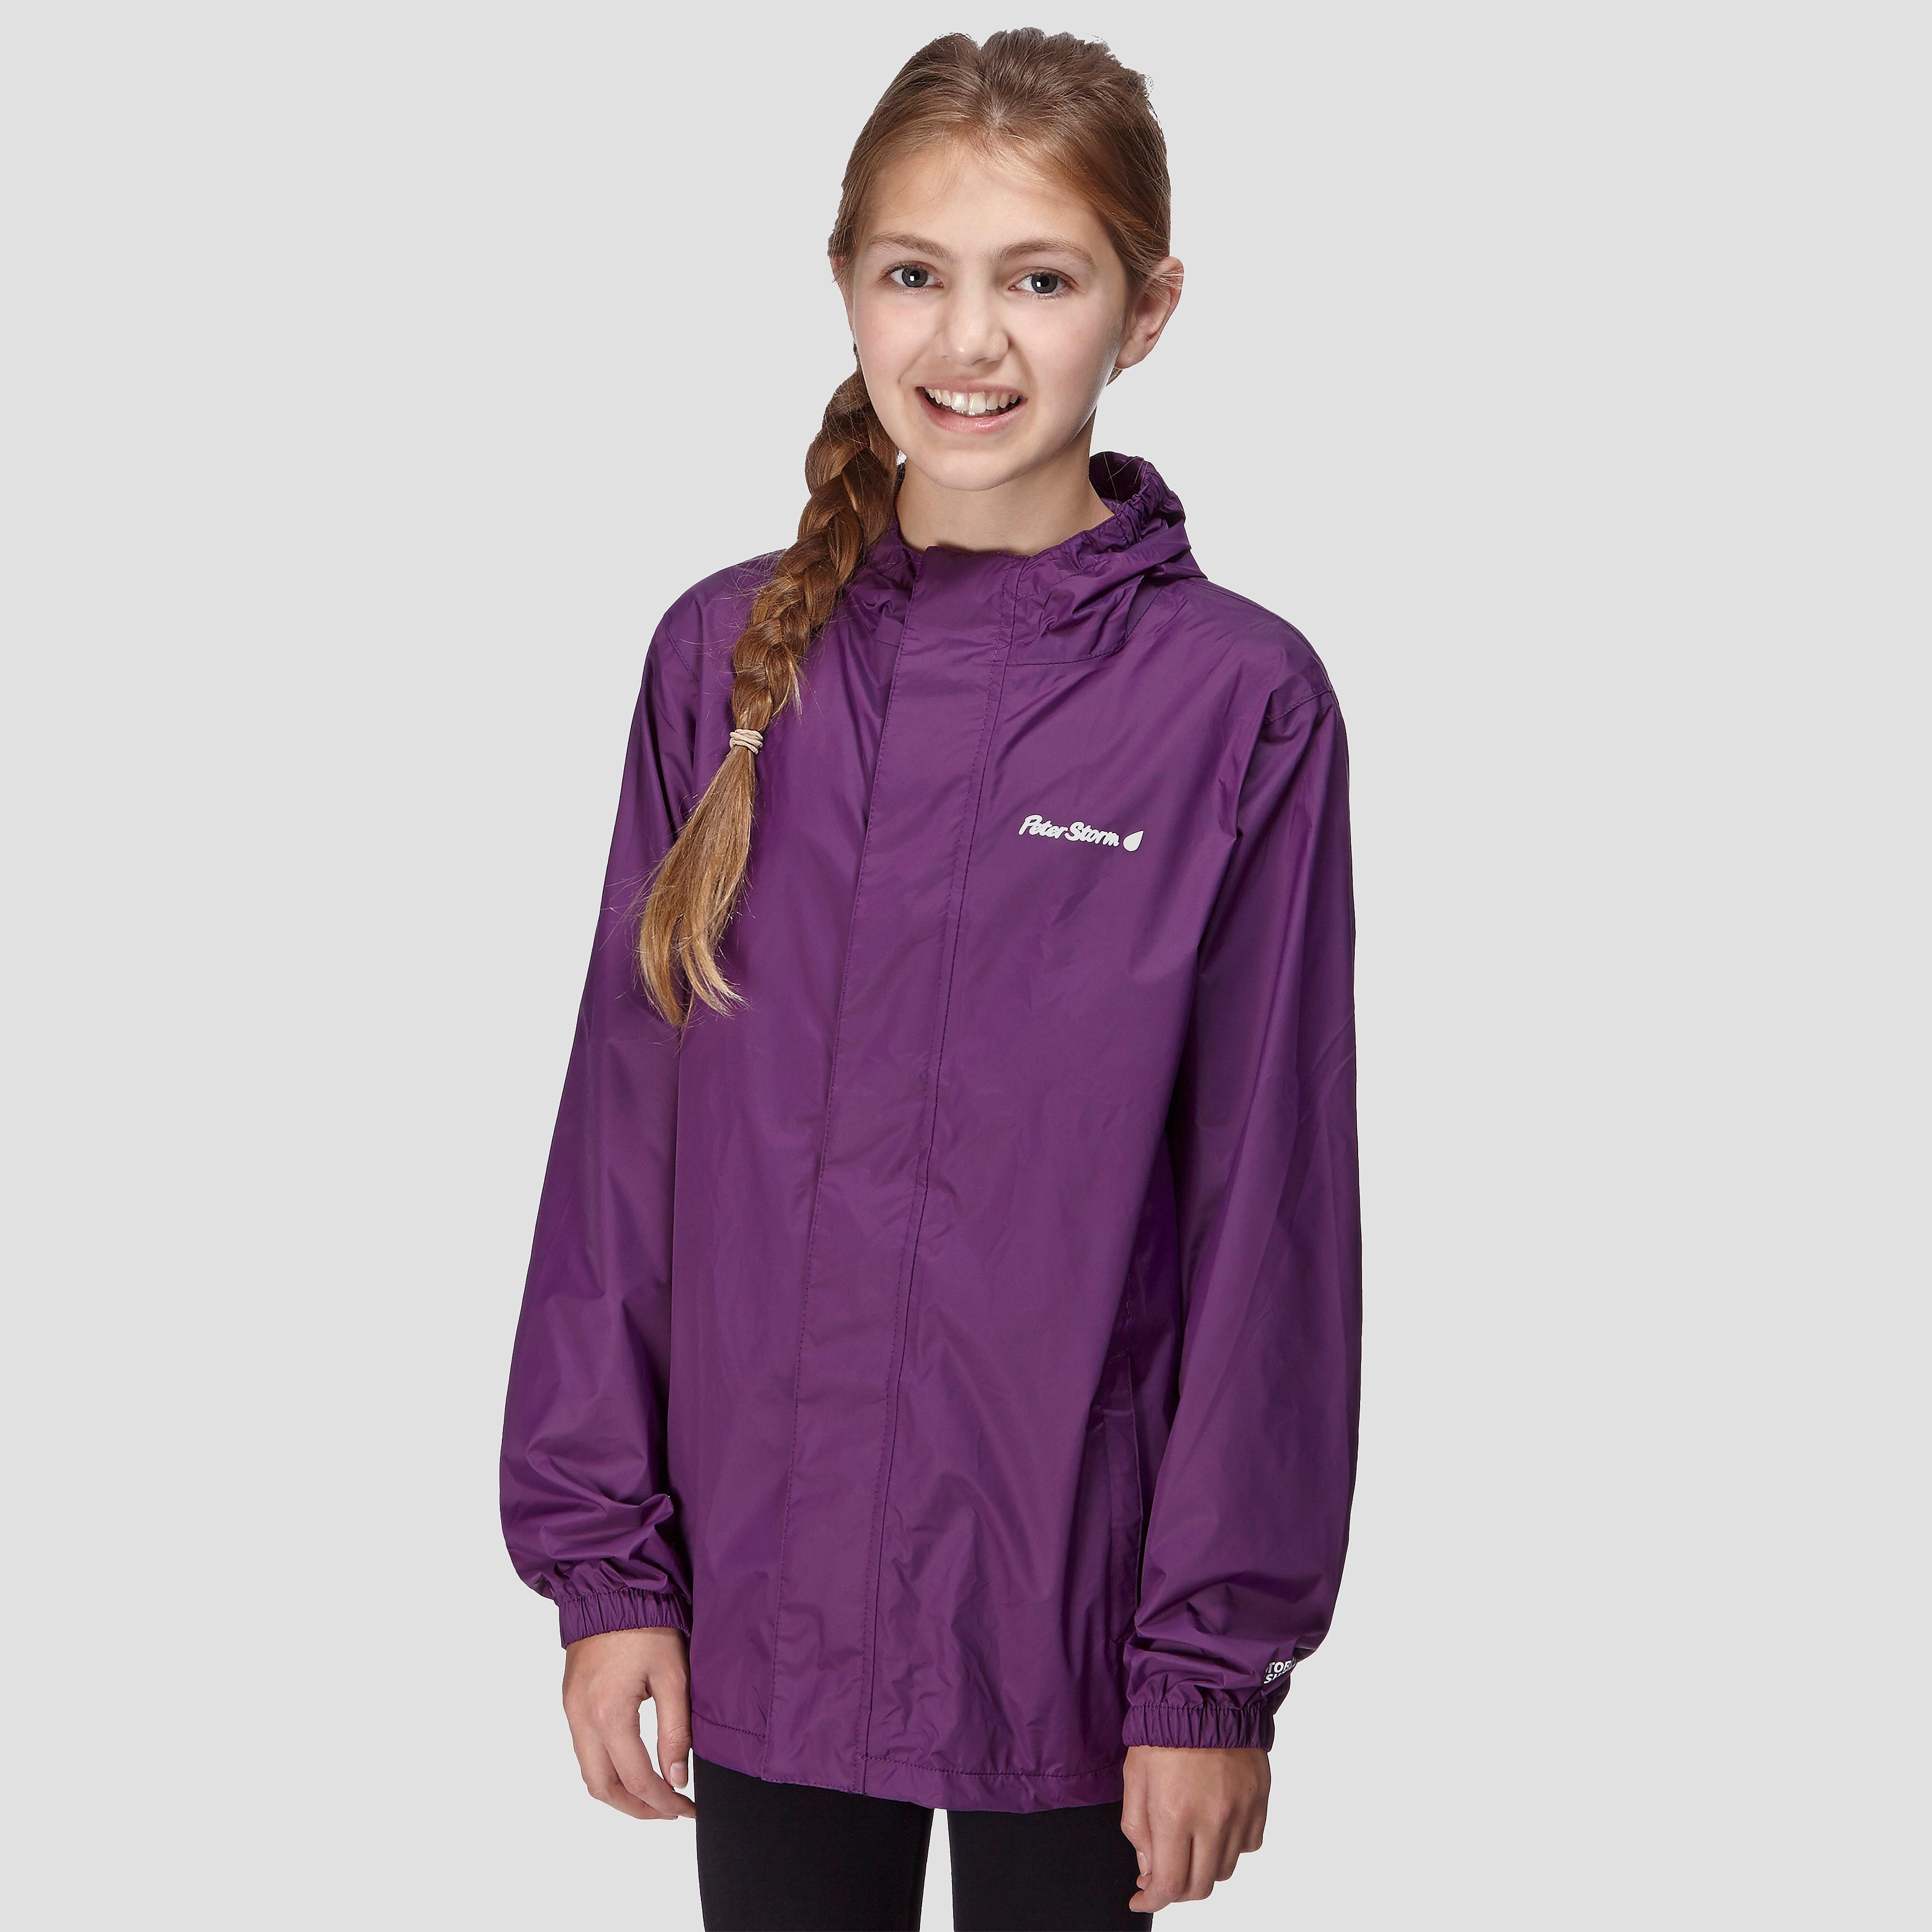 Peter Storm Girls' Packable Waterproof Jacket